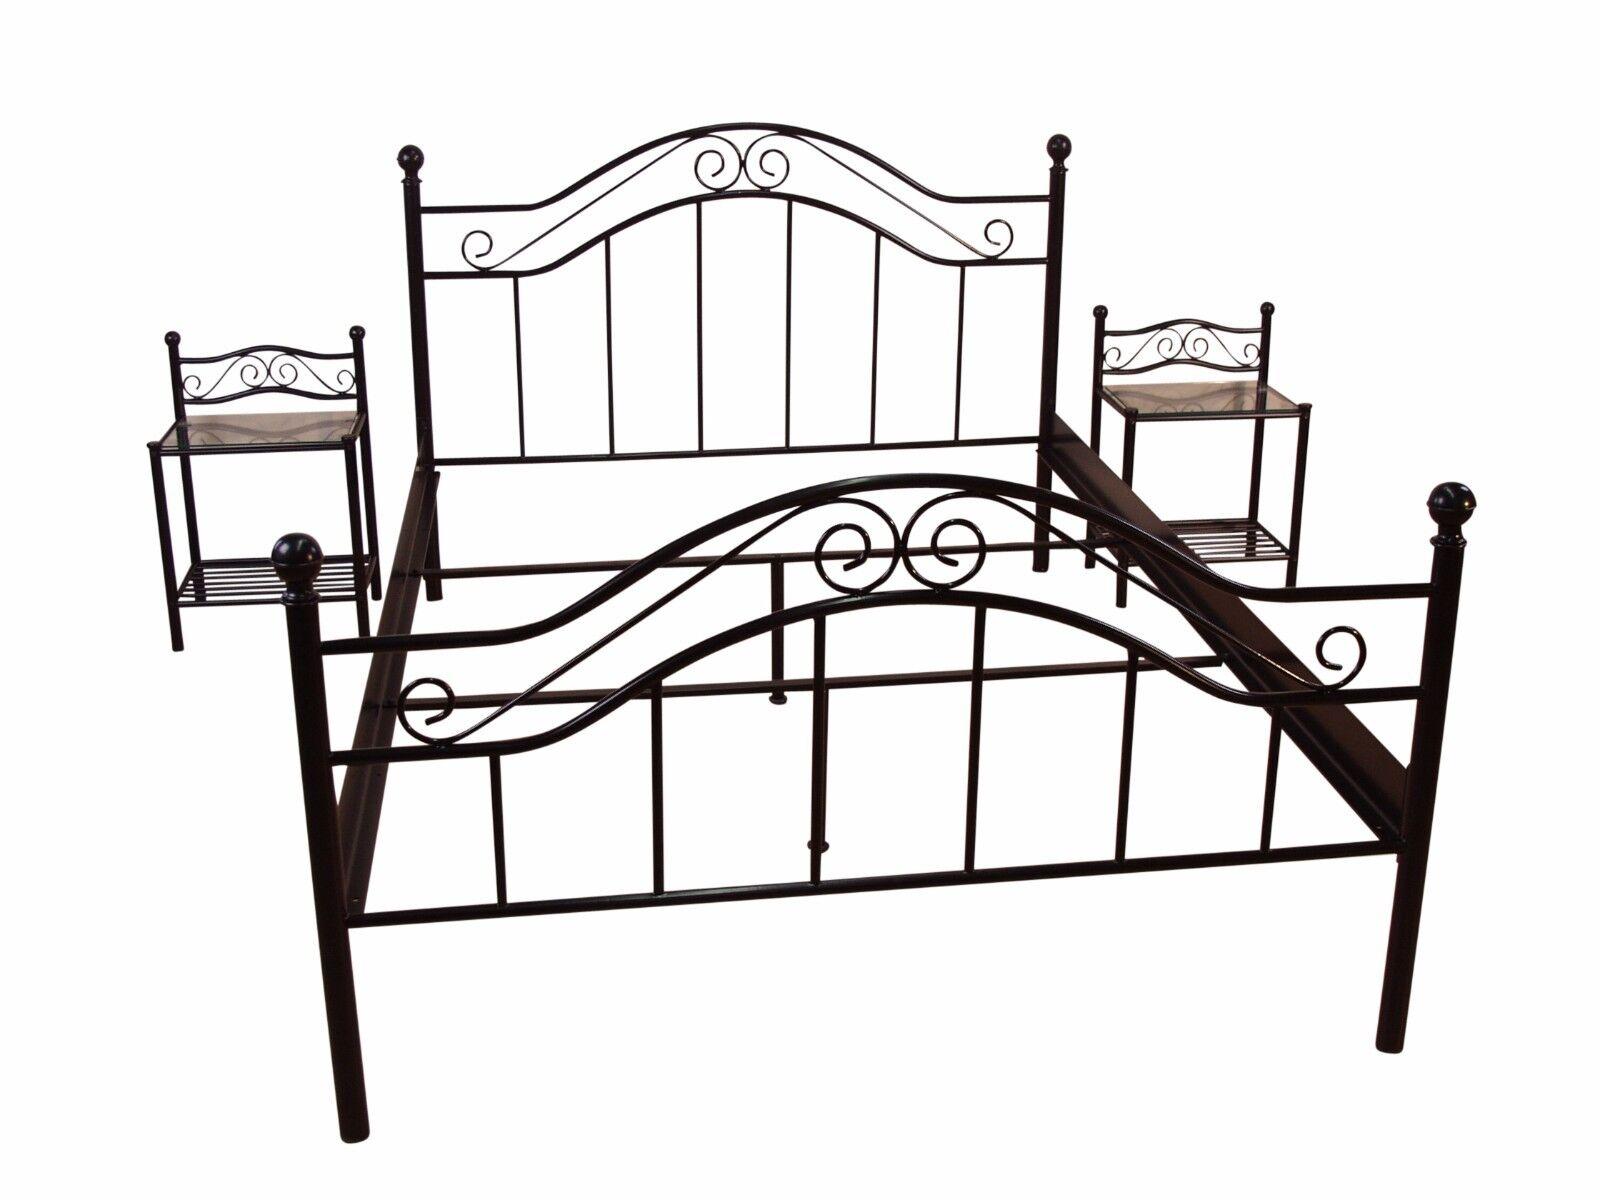 Metallbett schwarz 90x200  Metallbett schwarz 90x200 cm Bett romantisch Ehebett Doppelbett ...